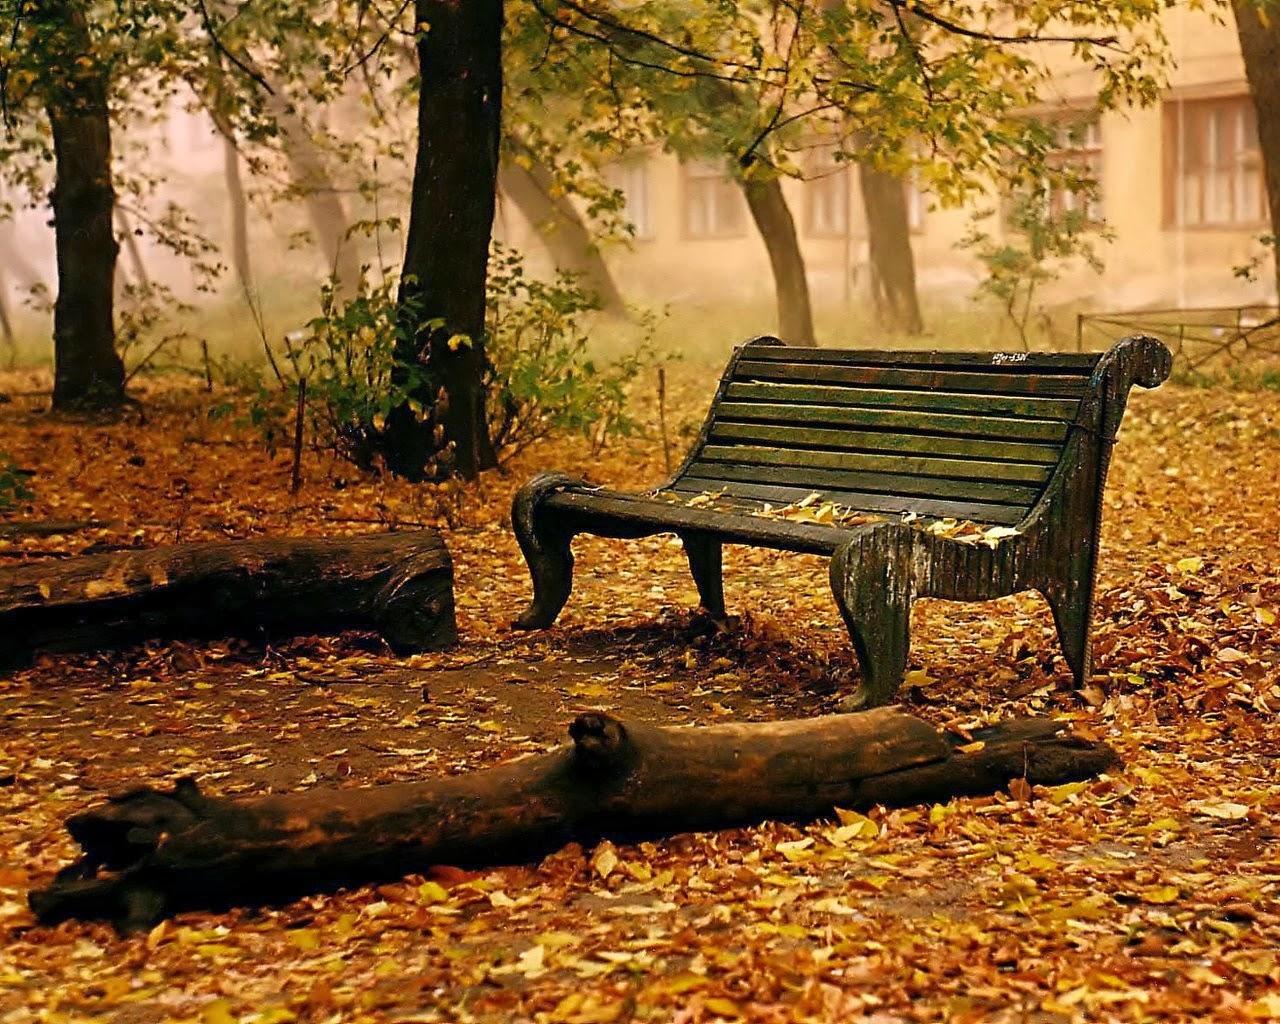 hd wallpaper 1080p autumn nature hd wallpaper 1080p autumn nature hd 1280x1024